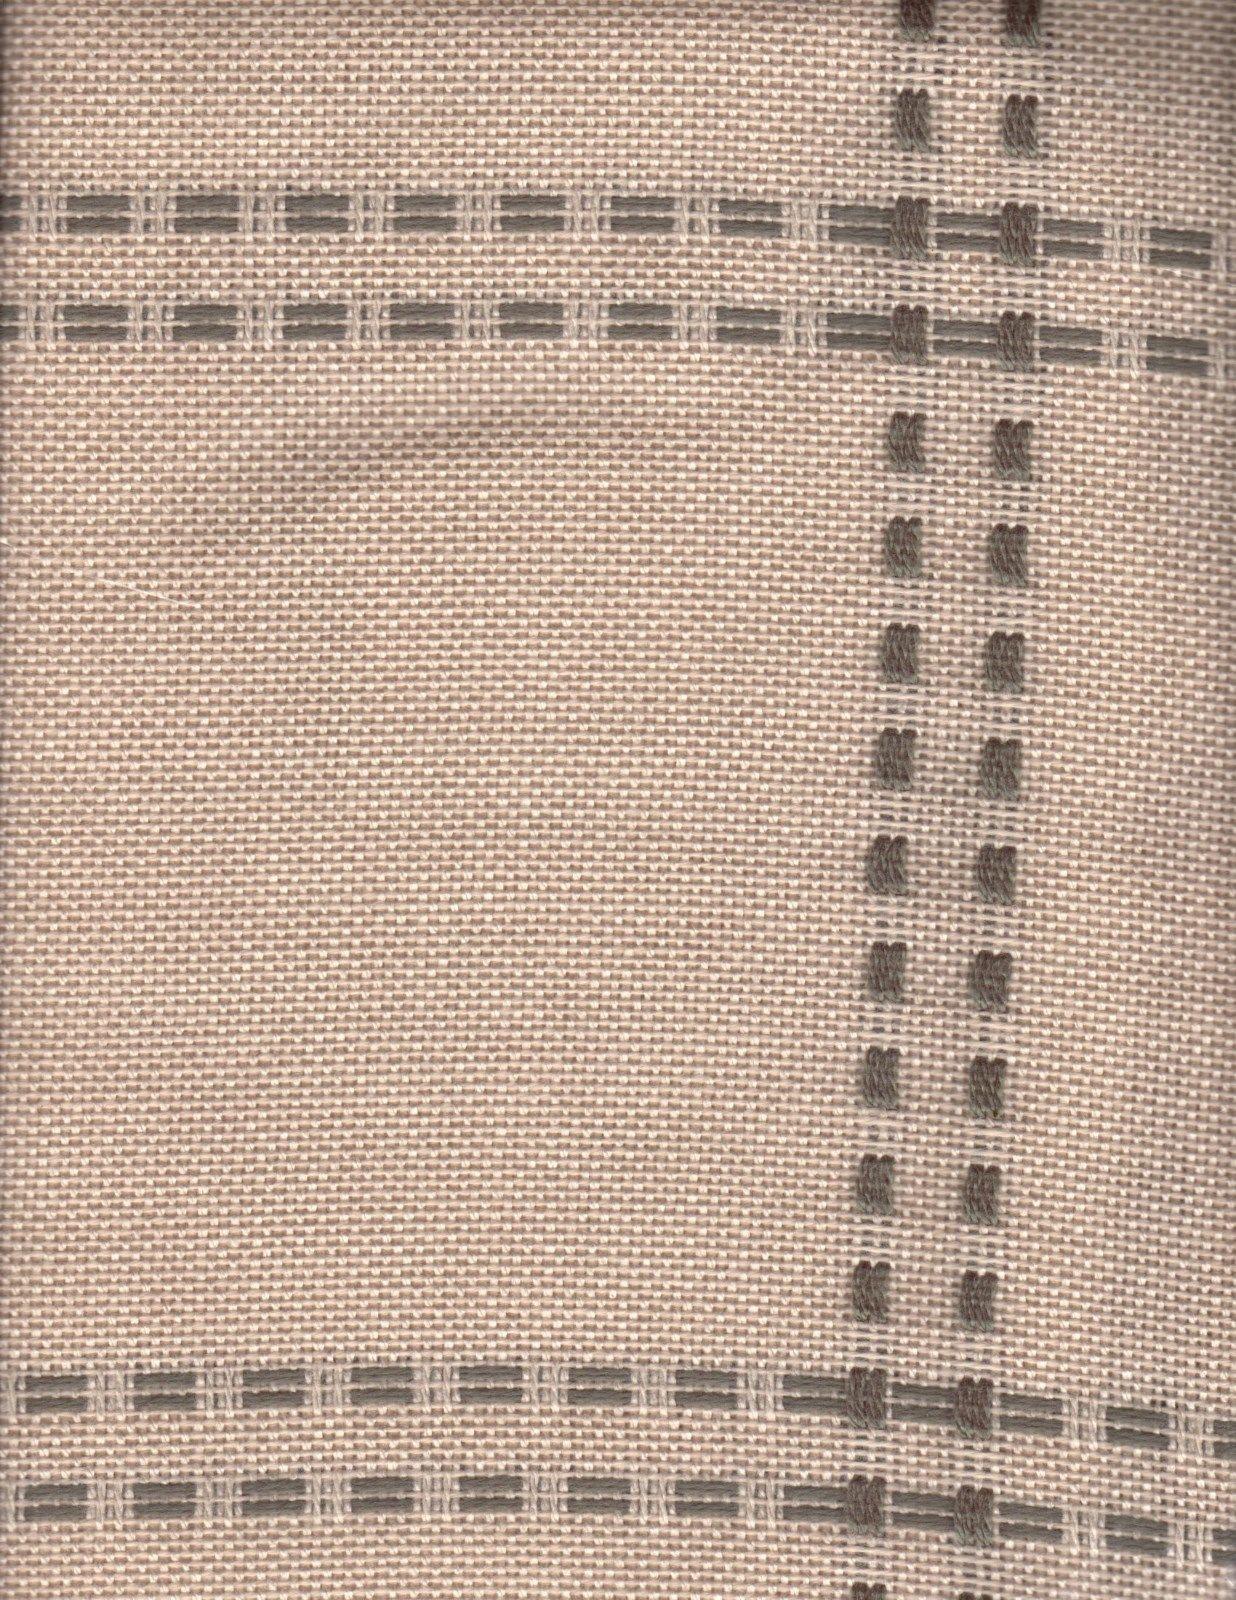 Embroidery Cloth Fabric 183196 Zweigart Hearthside Afghan Fabric